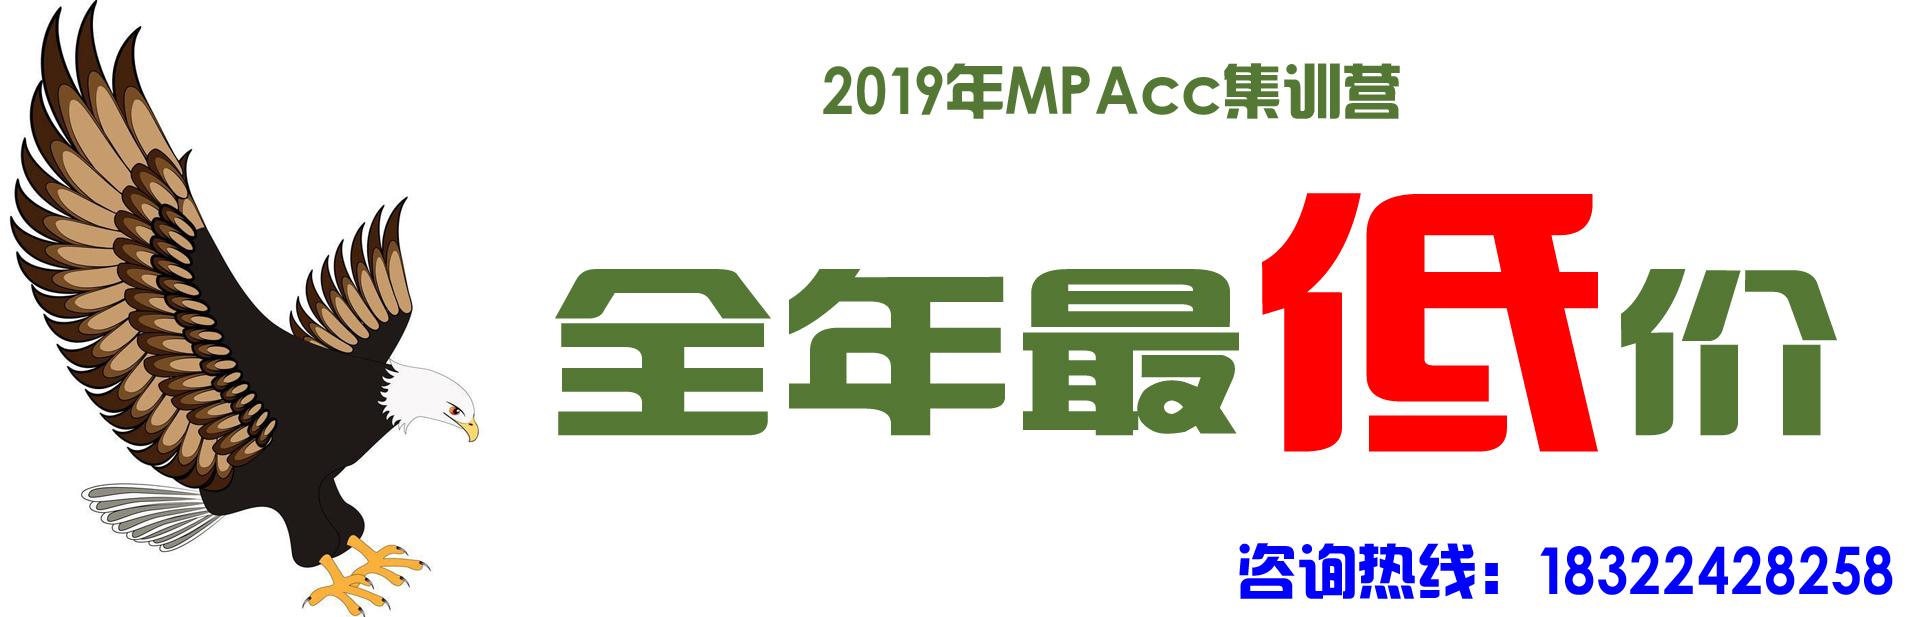 MPAcc集训营全年最低价